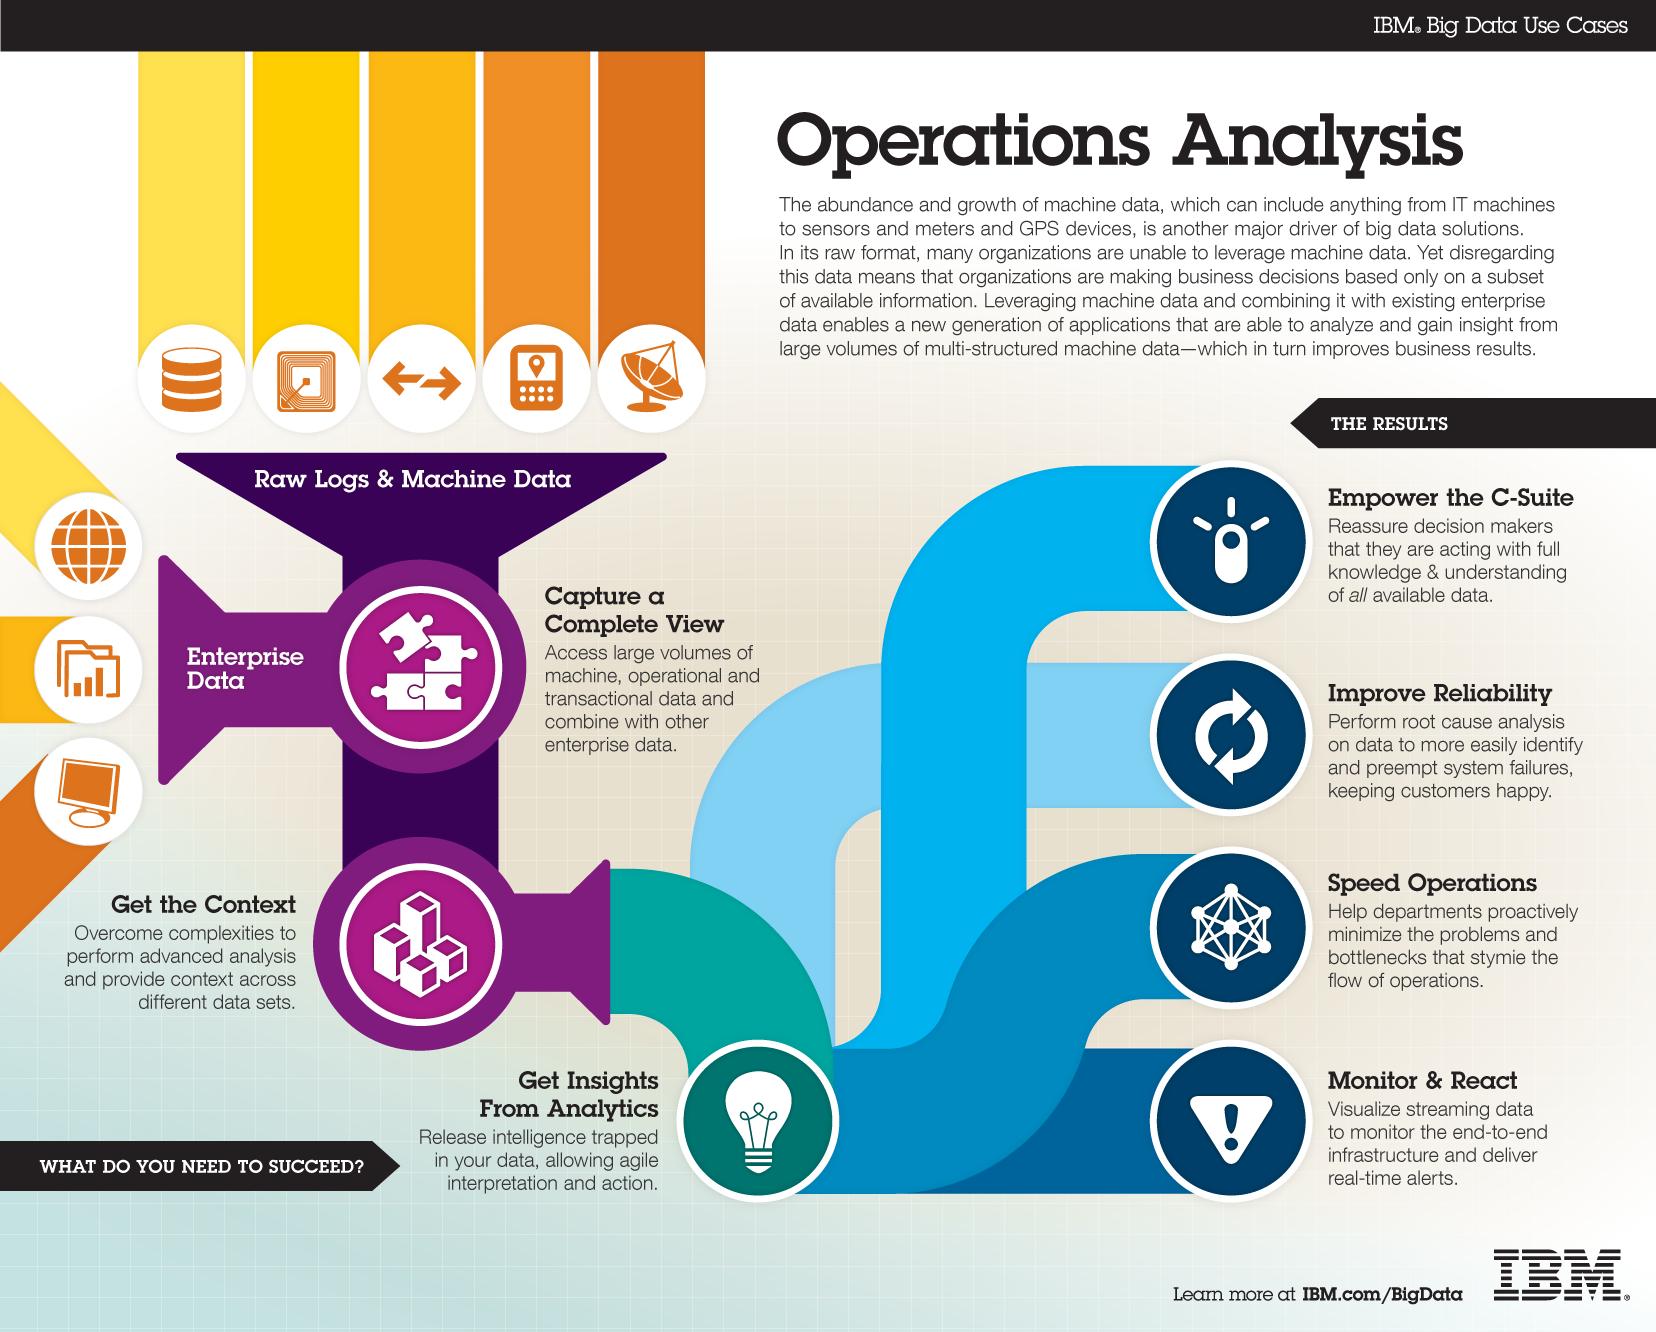 Operations Analysis - Big Data Use Case | Data + Analytics ...